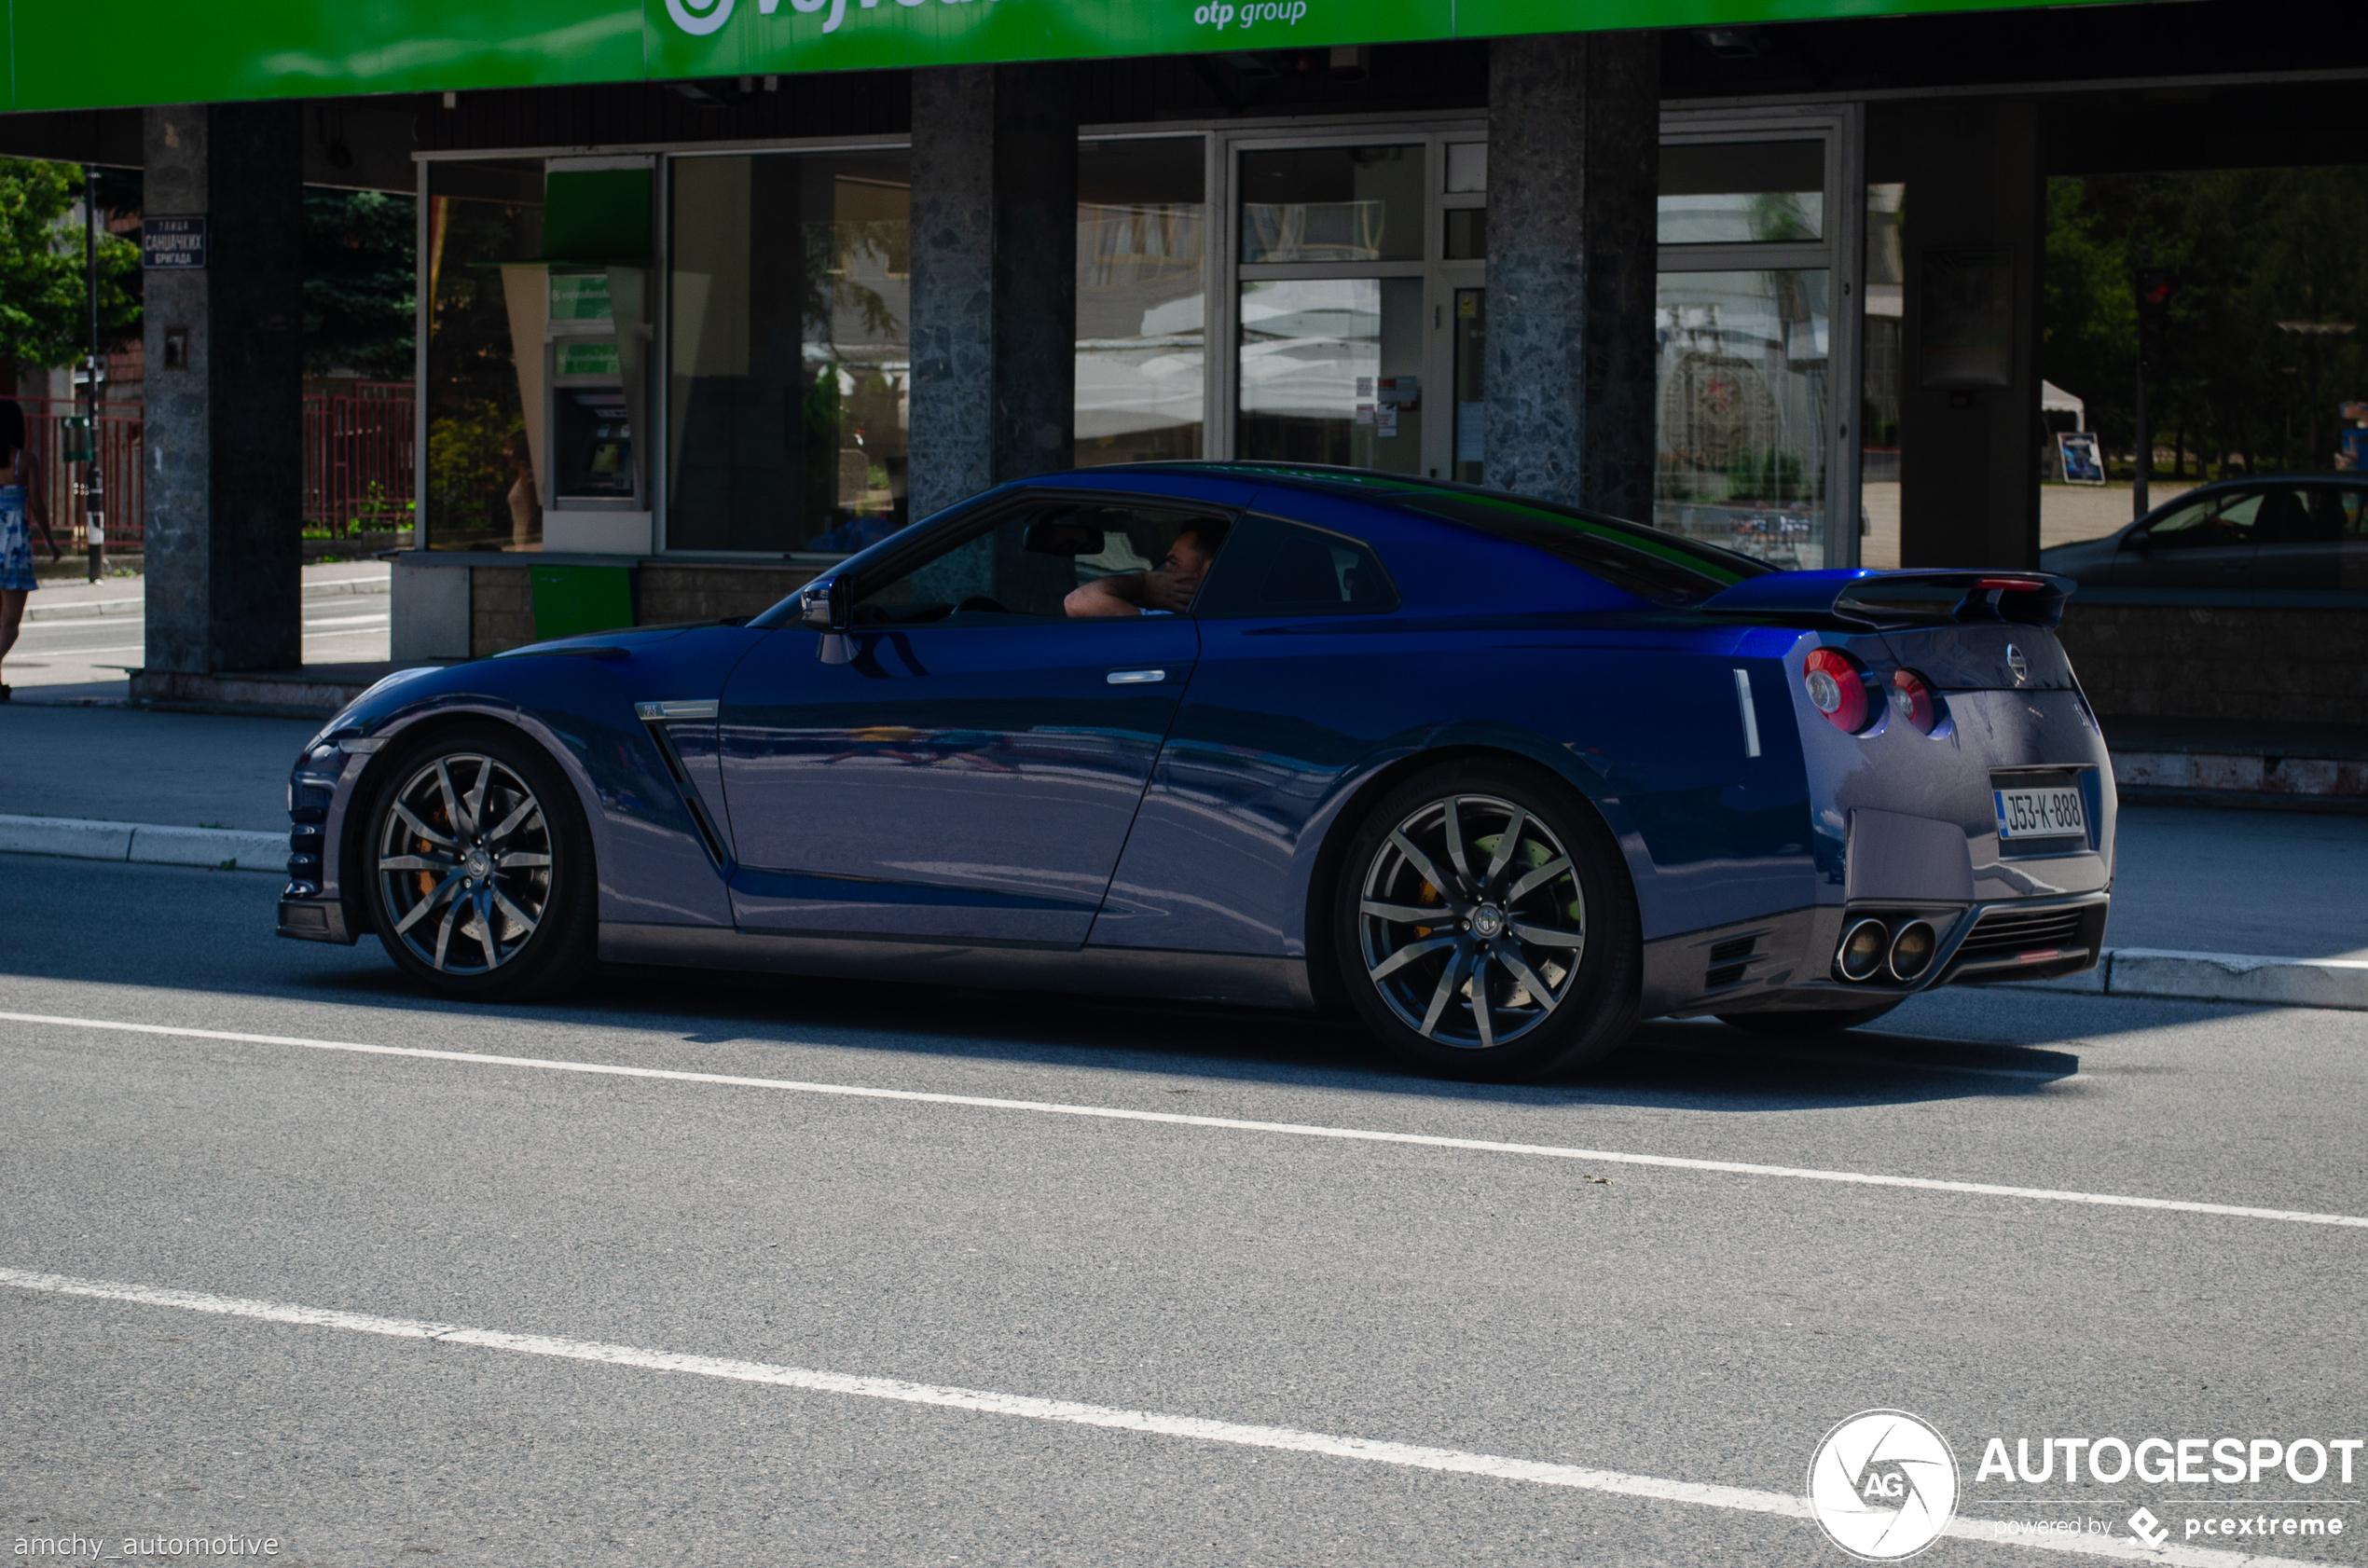 NissanGT-R 2015